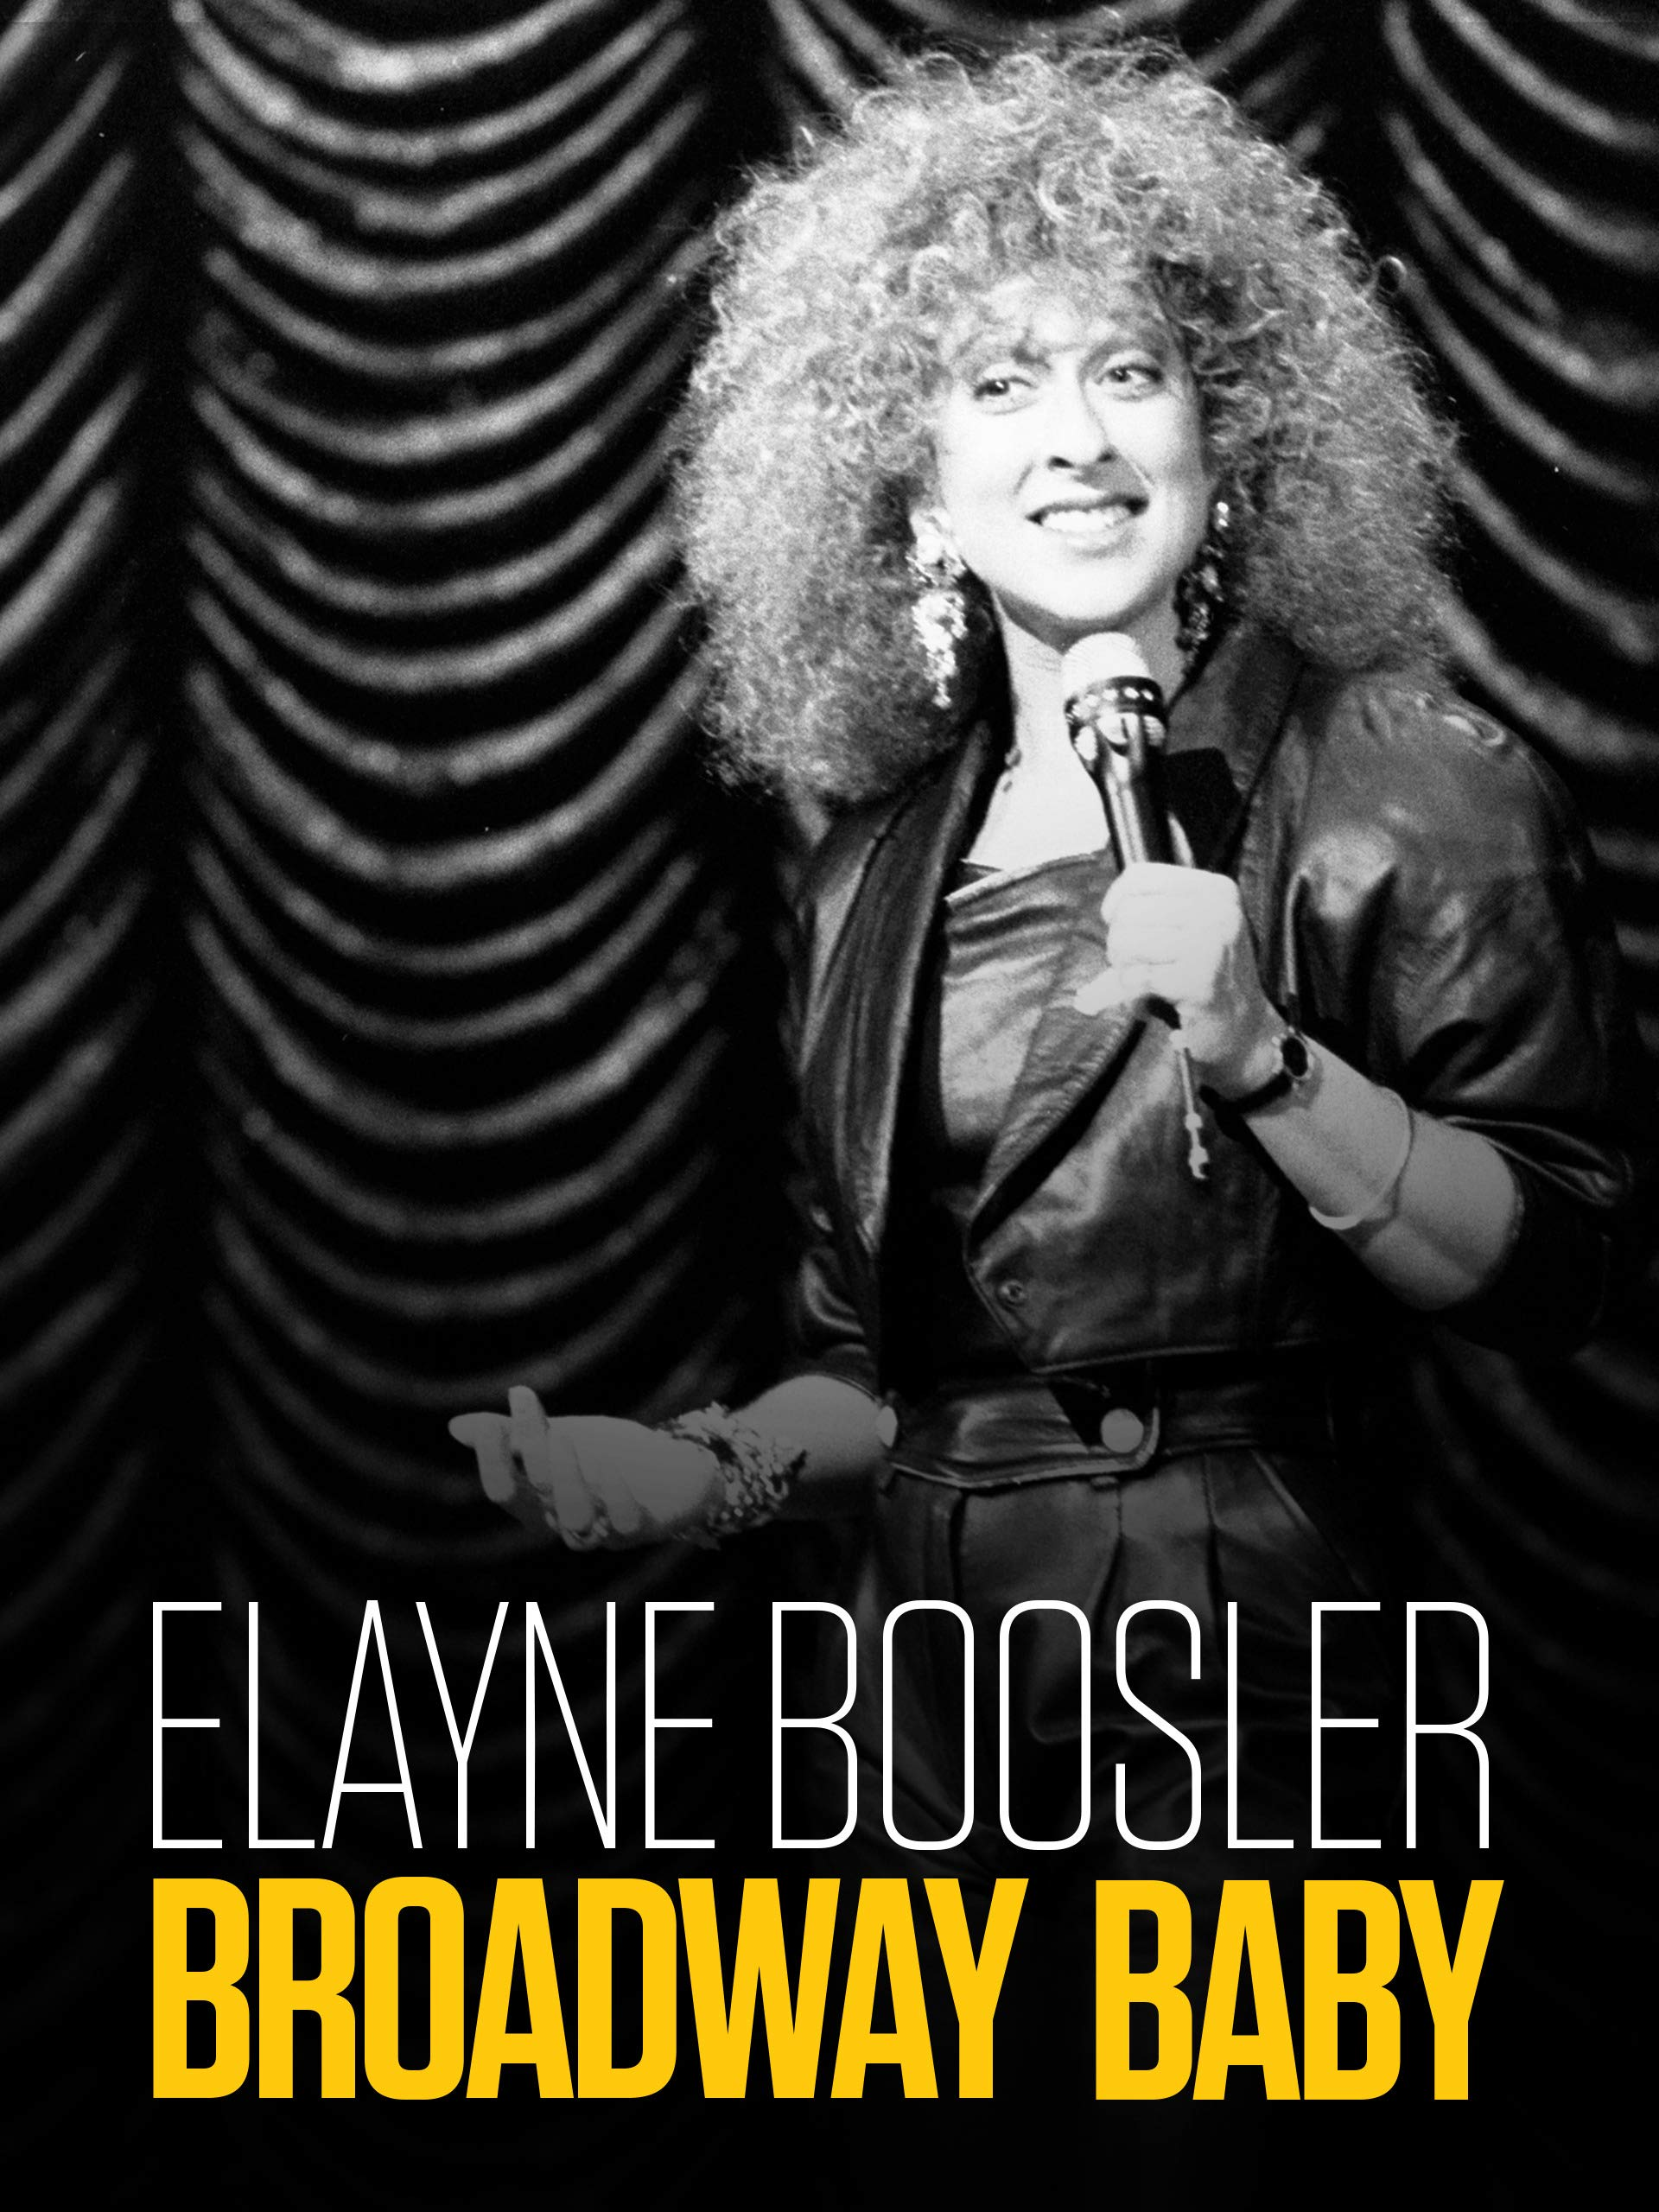 Elayne Boosler: Broadway Baby